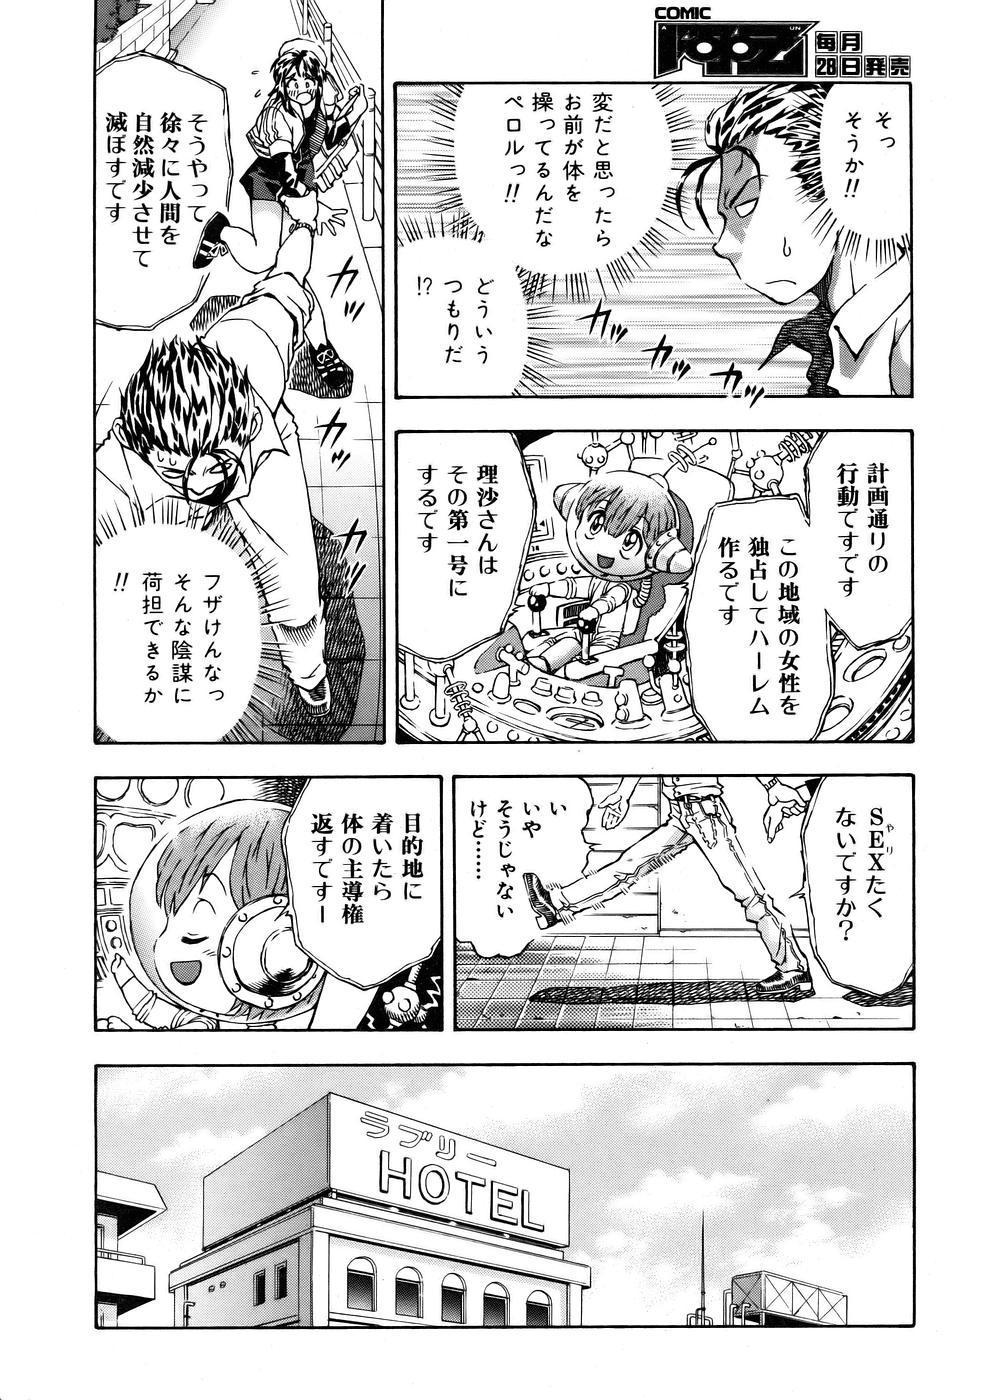 COMIC AUN 2005-10 Vol. 113 351